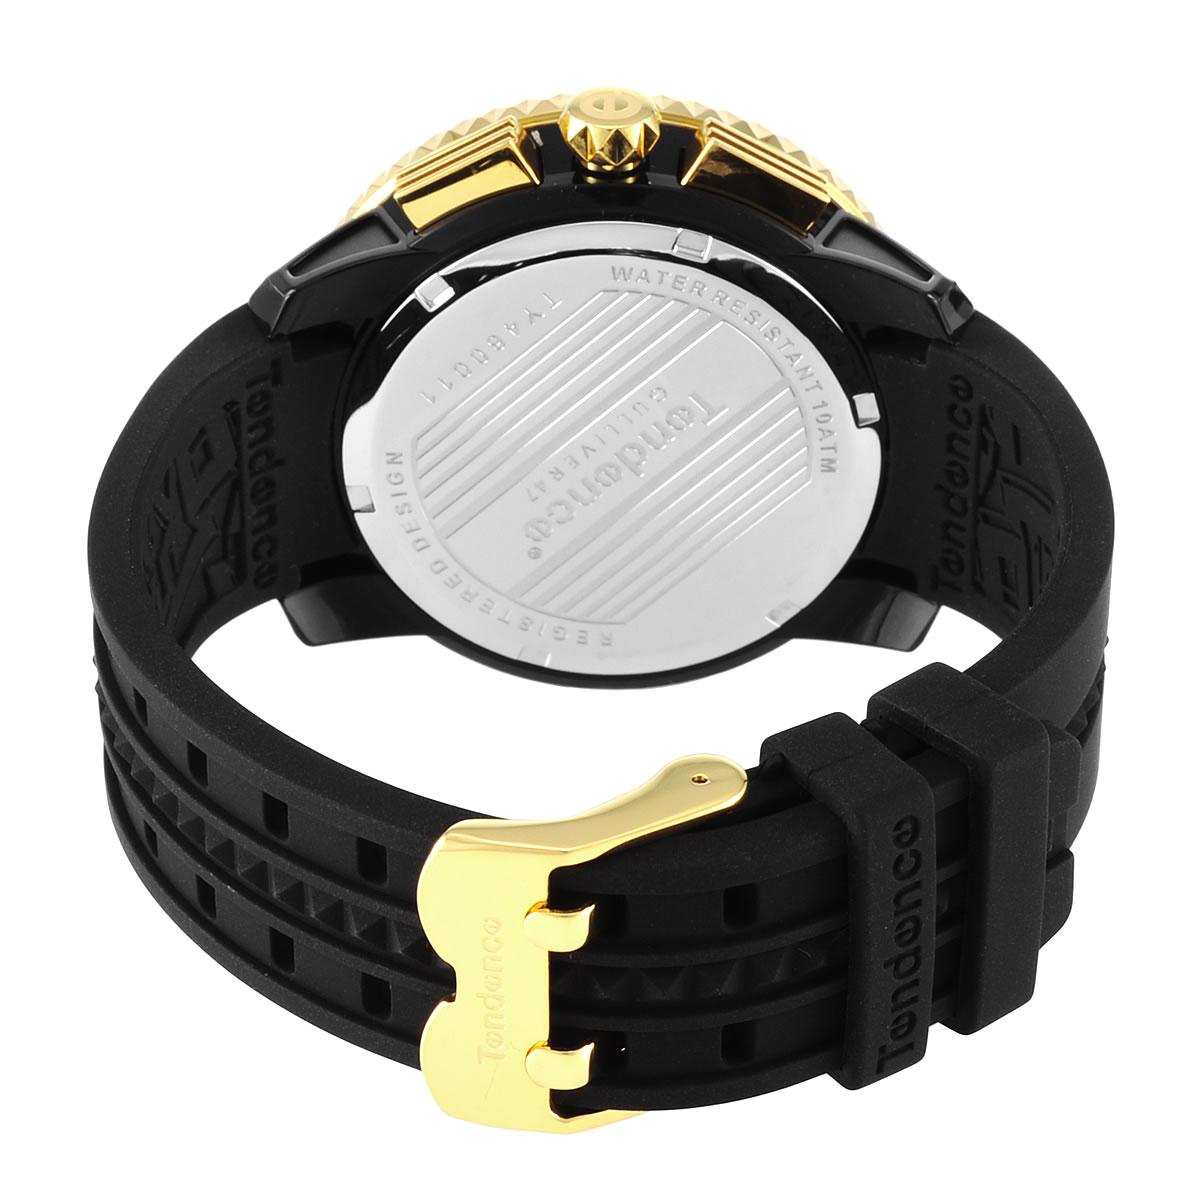 Tendence テンデンス 腕時計 ウォッチ